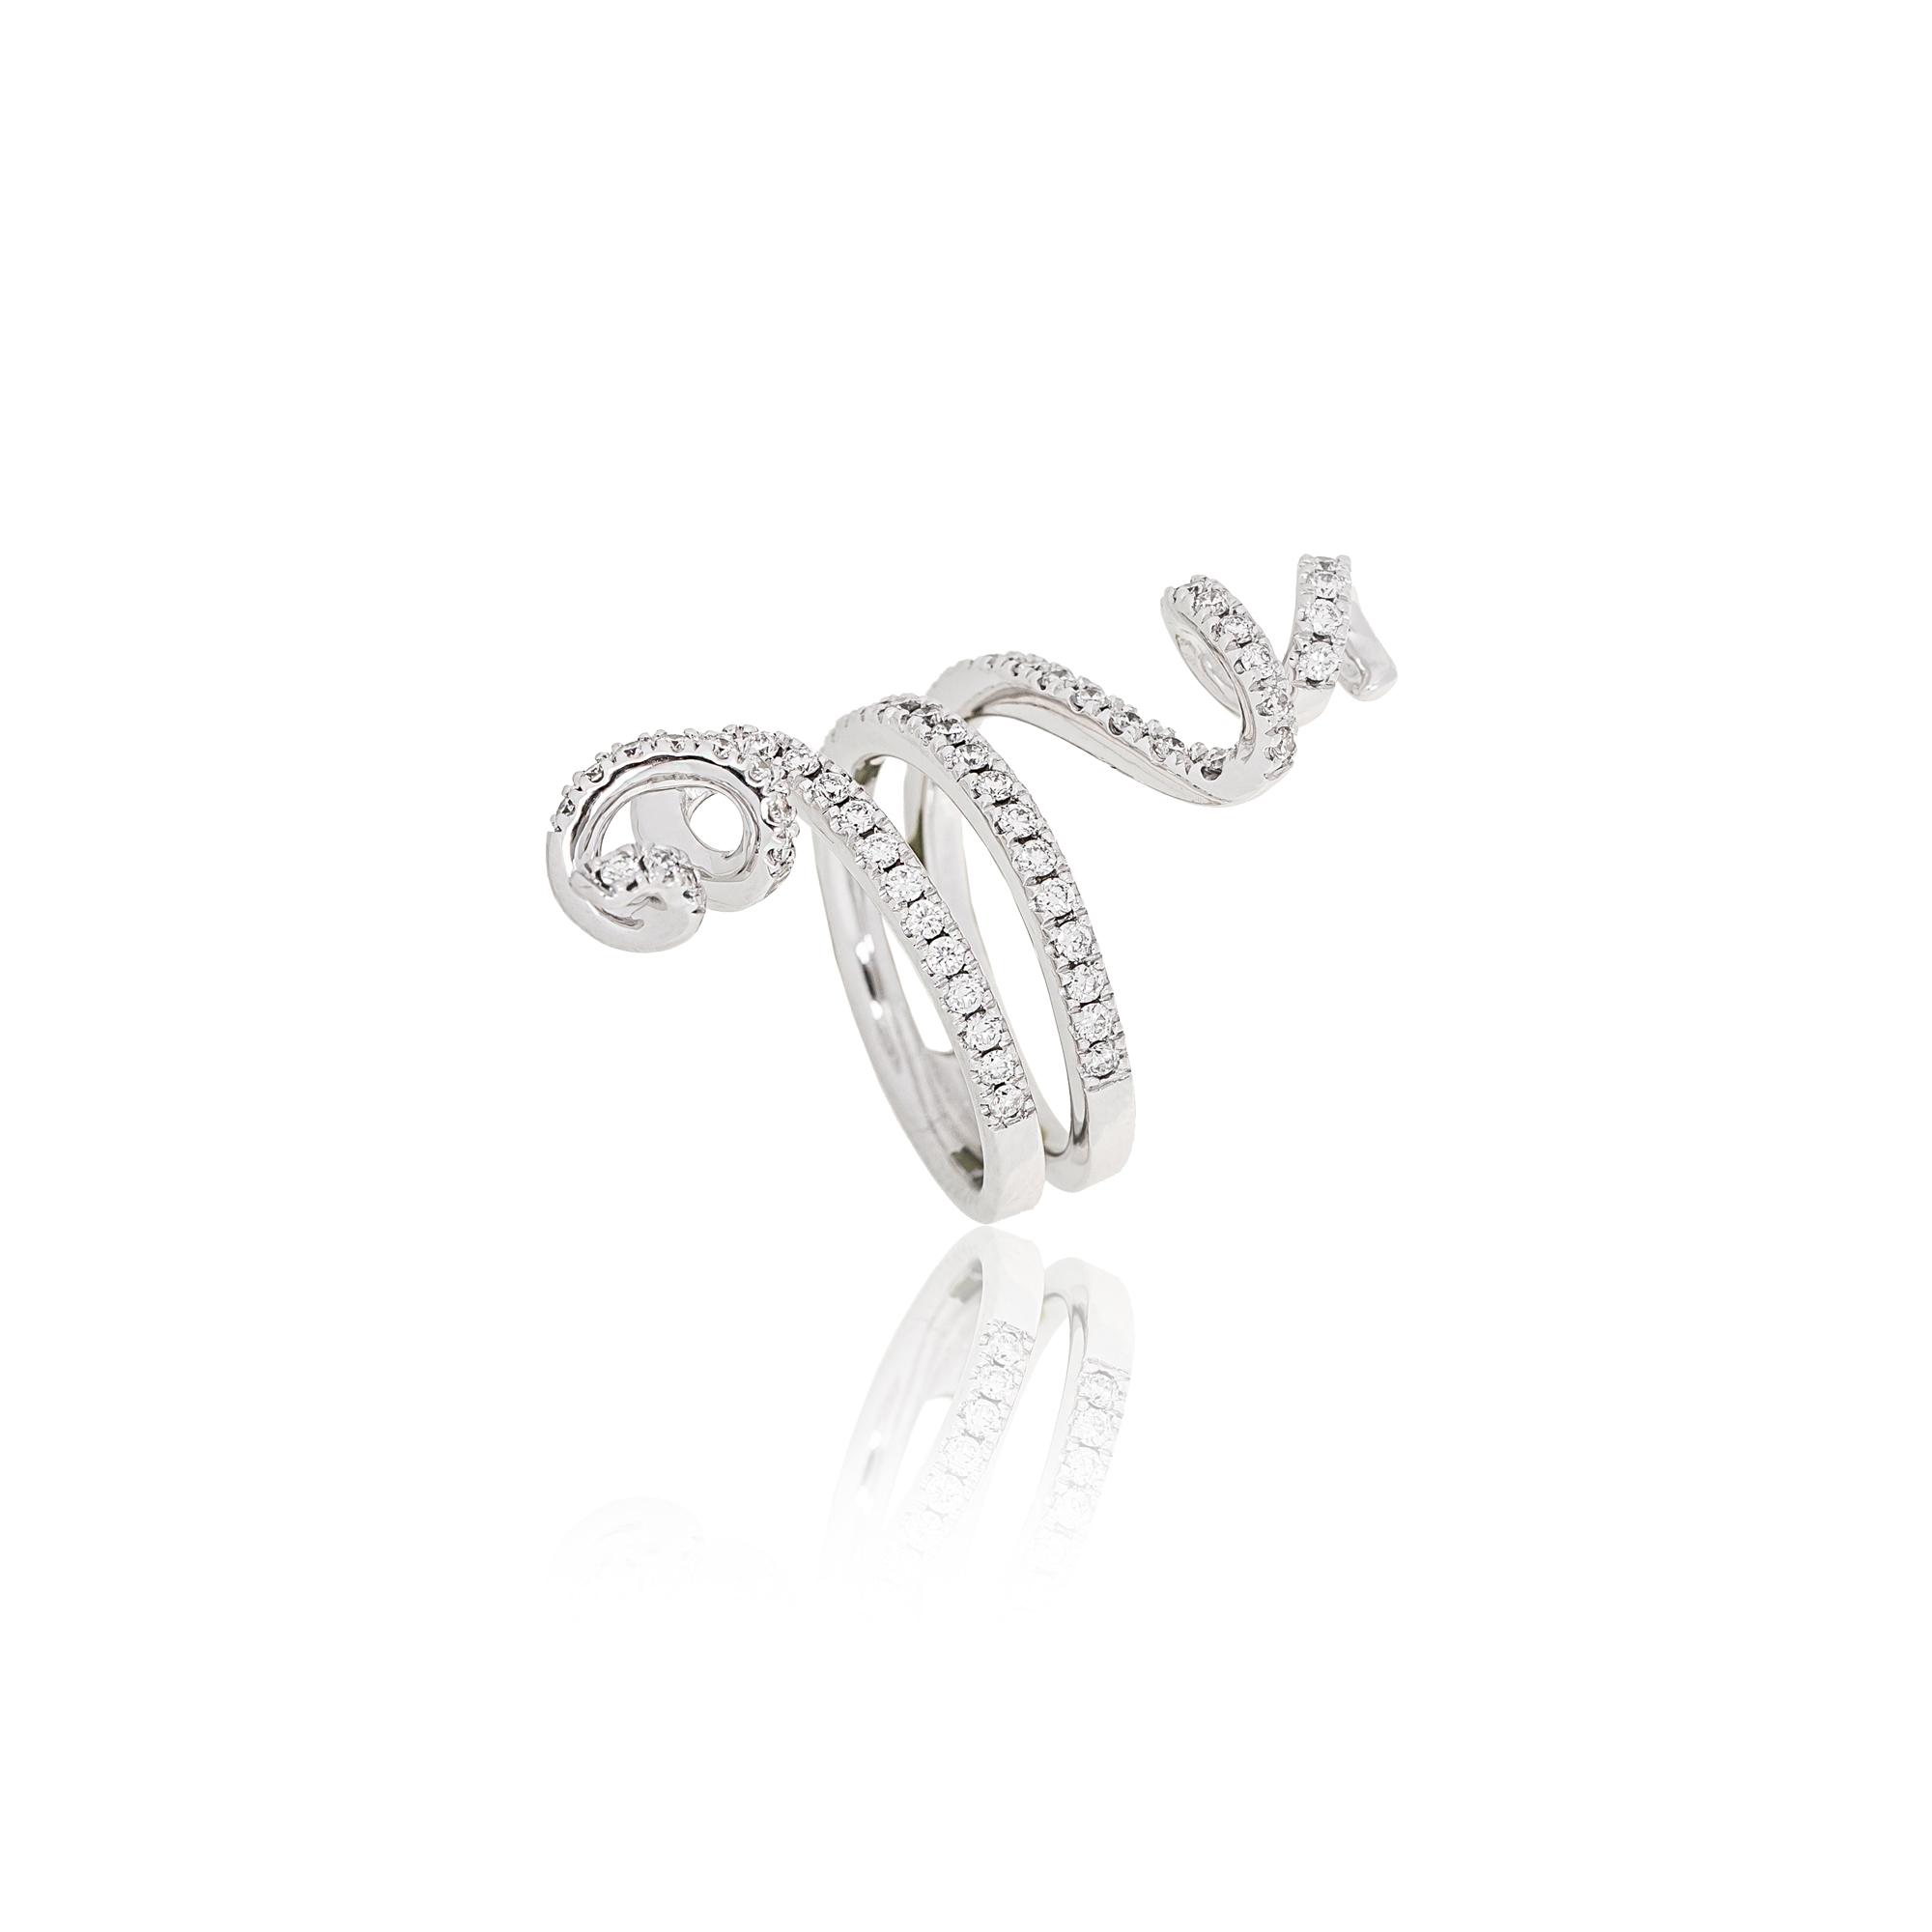 Ring nastri white gold 18kt with diamonds